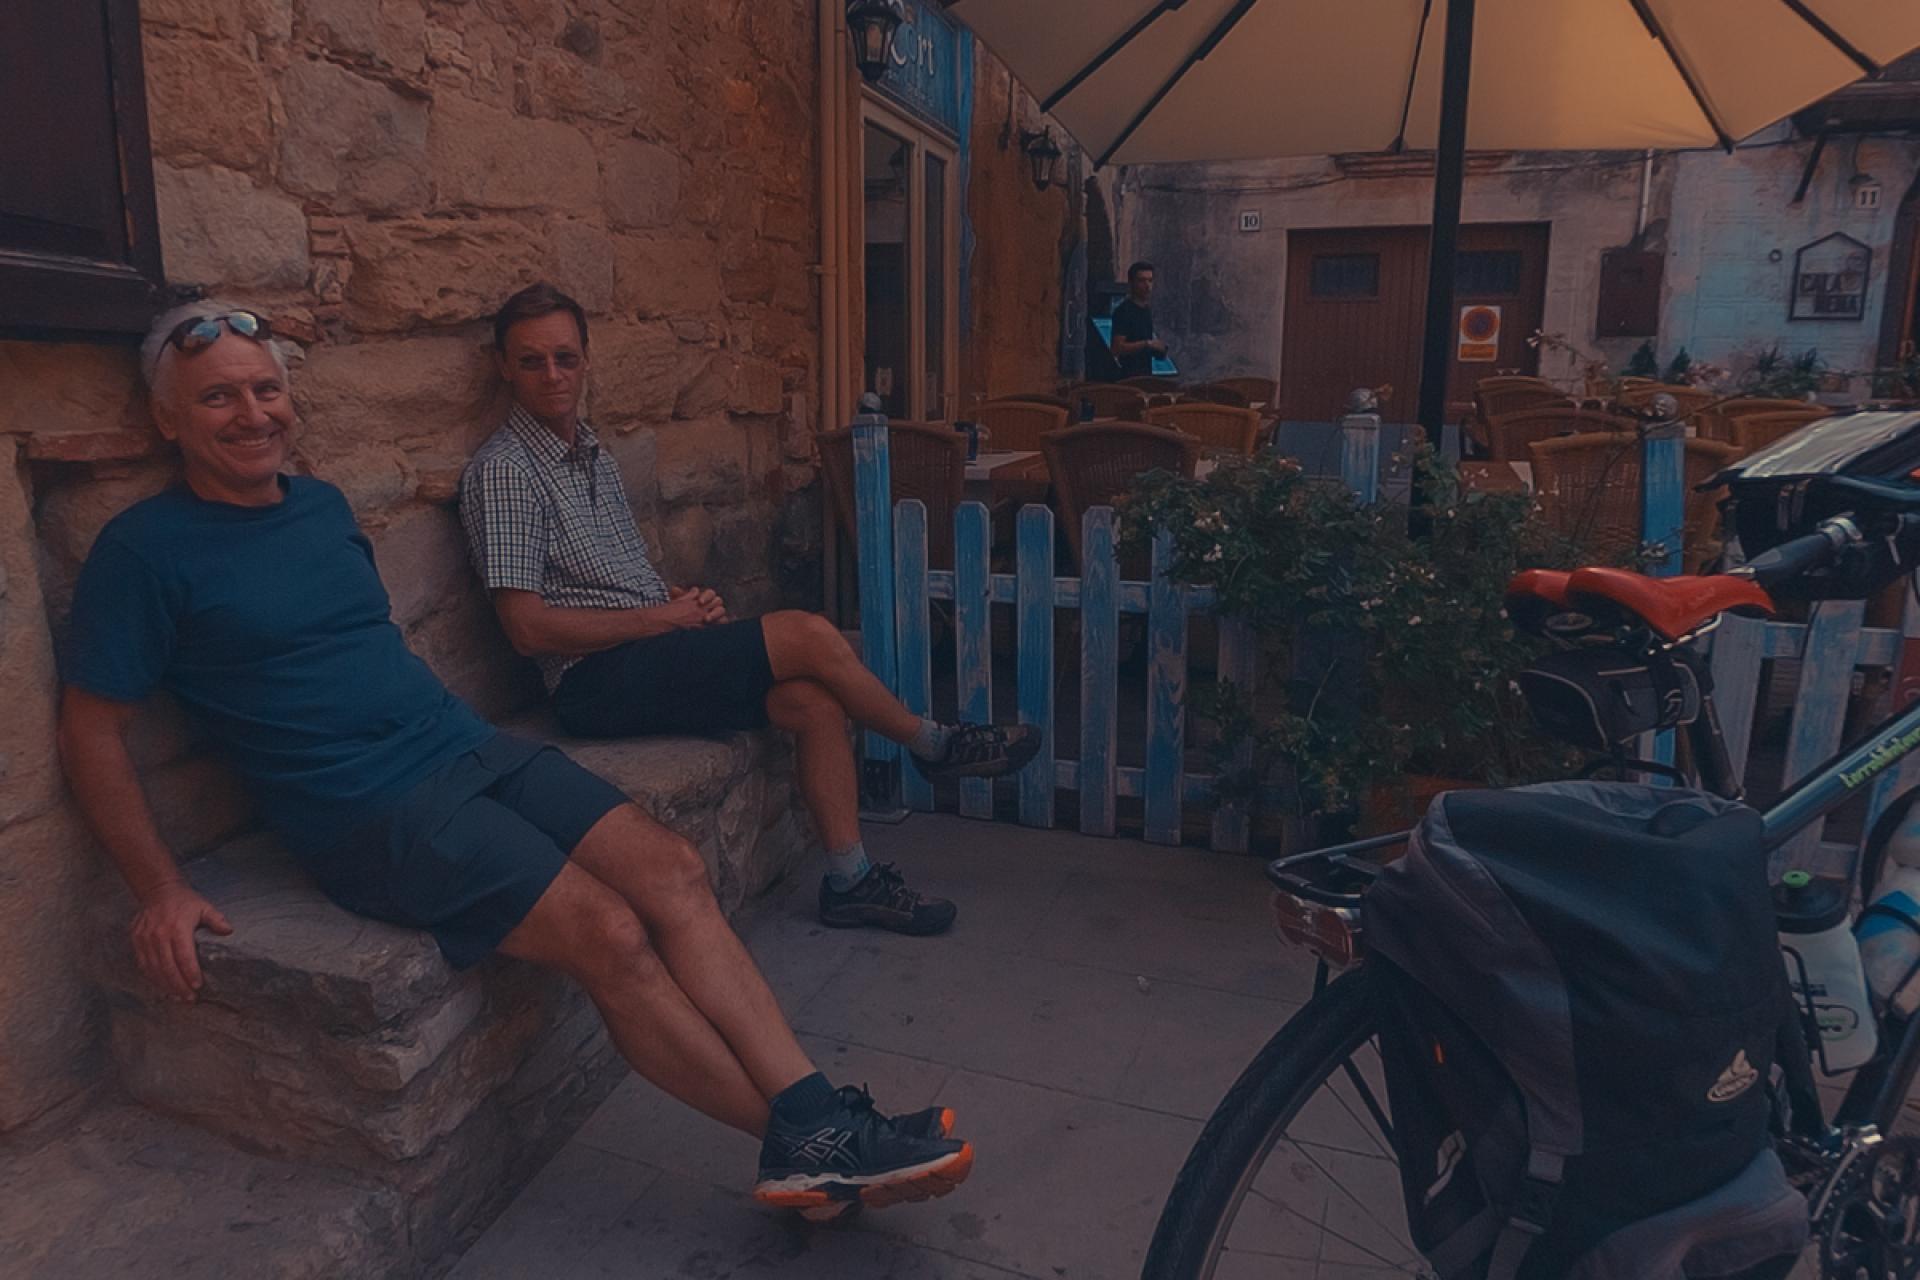 Barcelona Bike Tour Costa Brava Culinary Biking